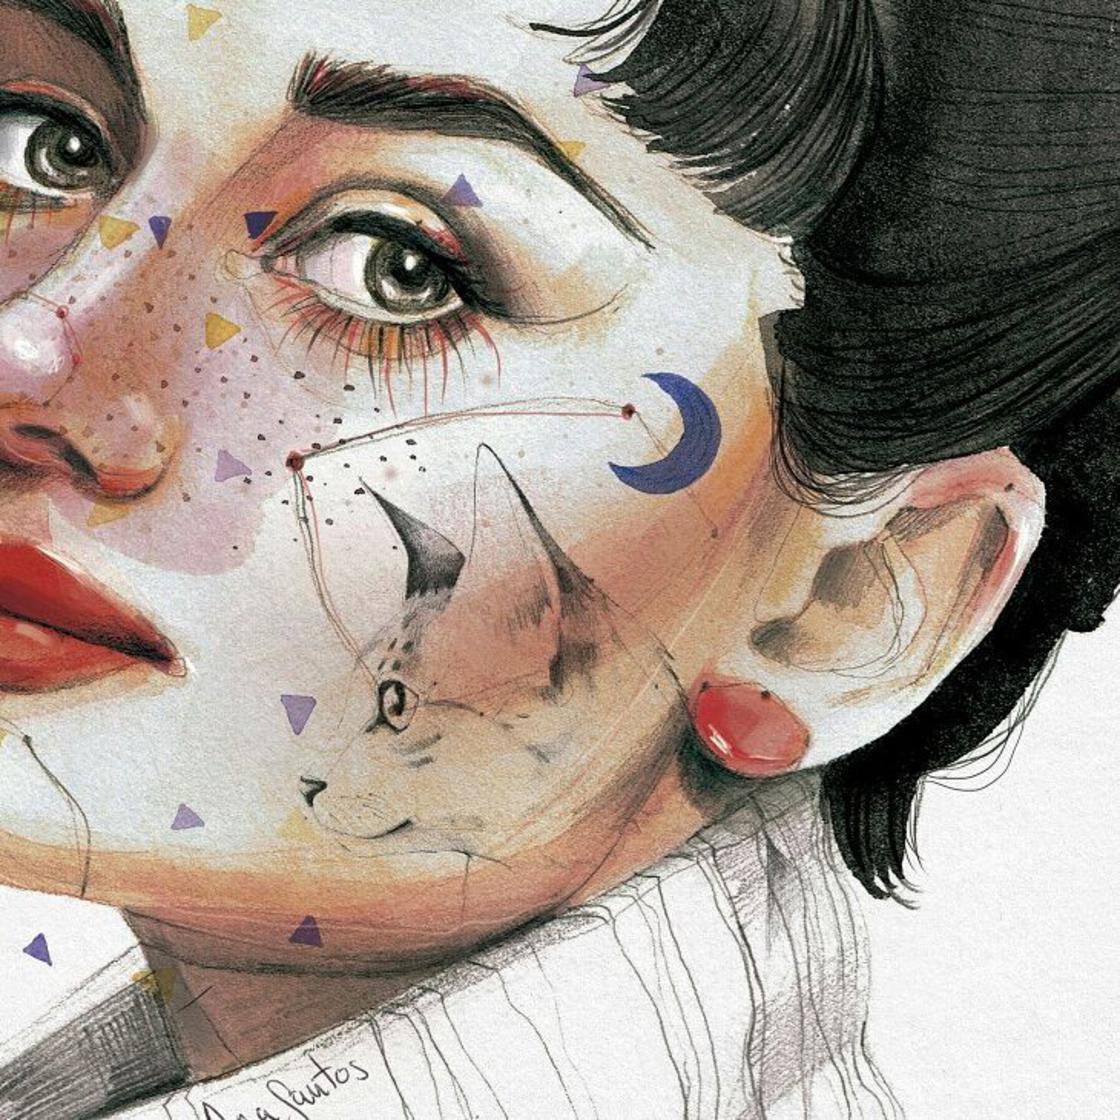 ana-santos-girl-portraits-10.jpg